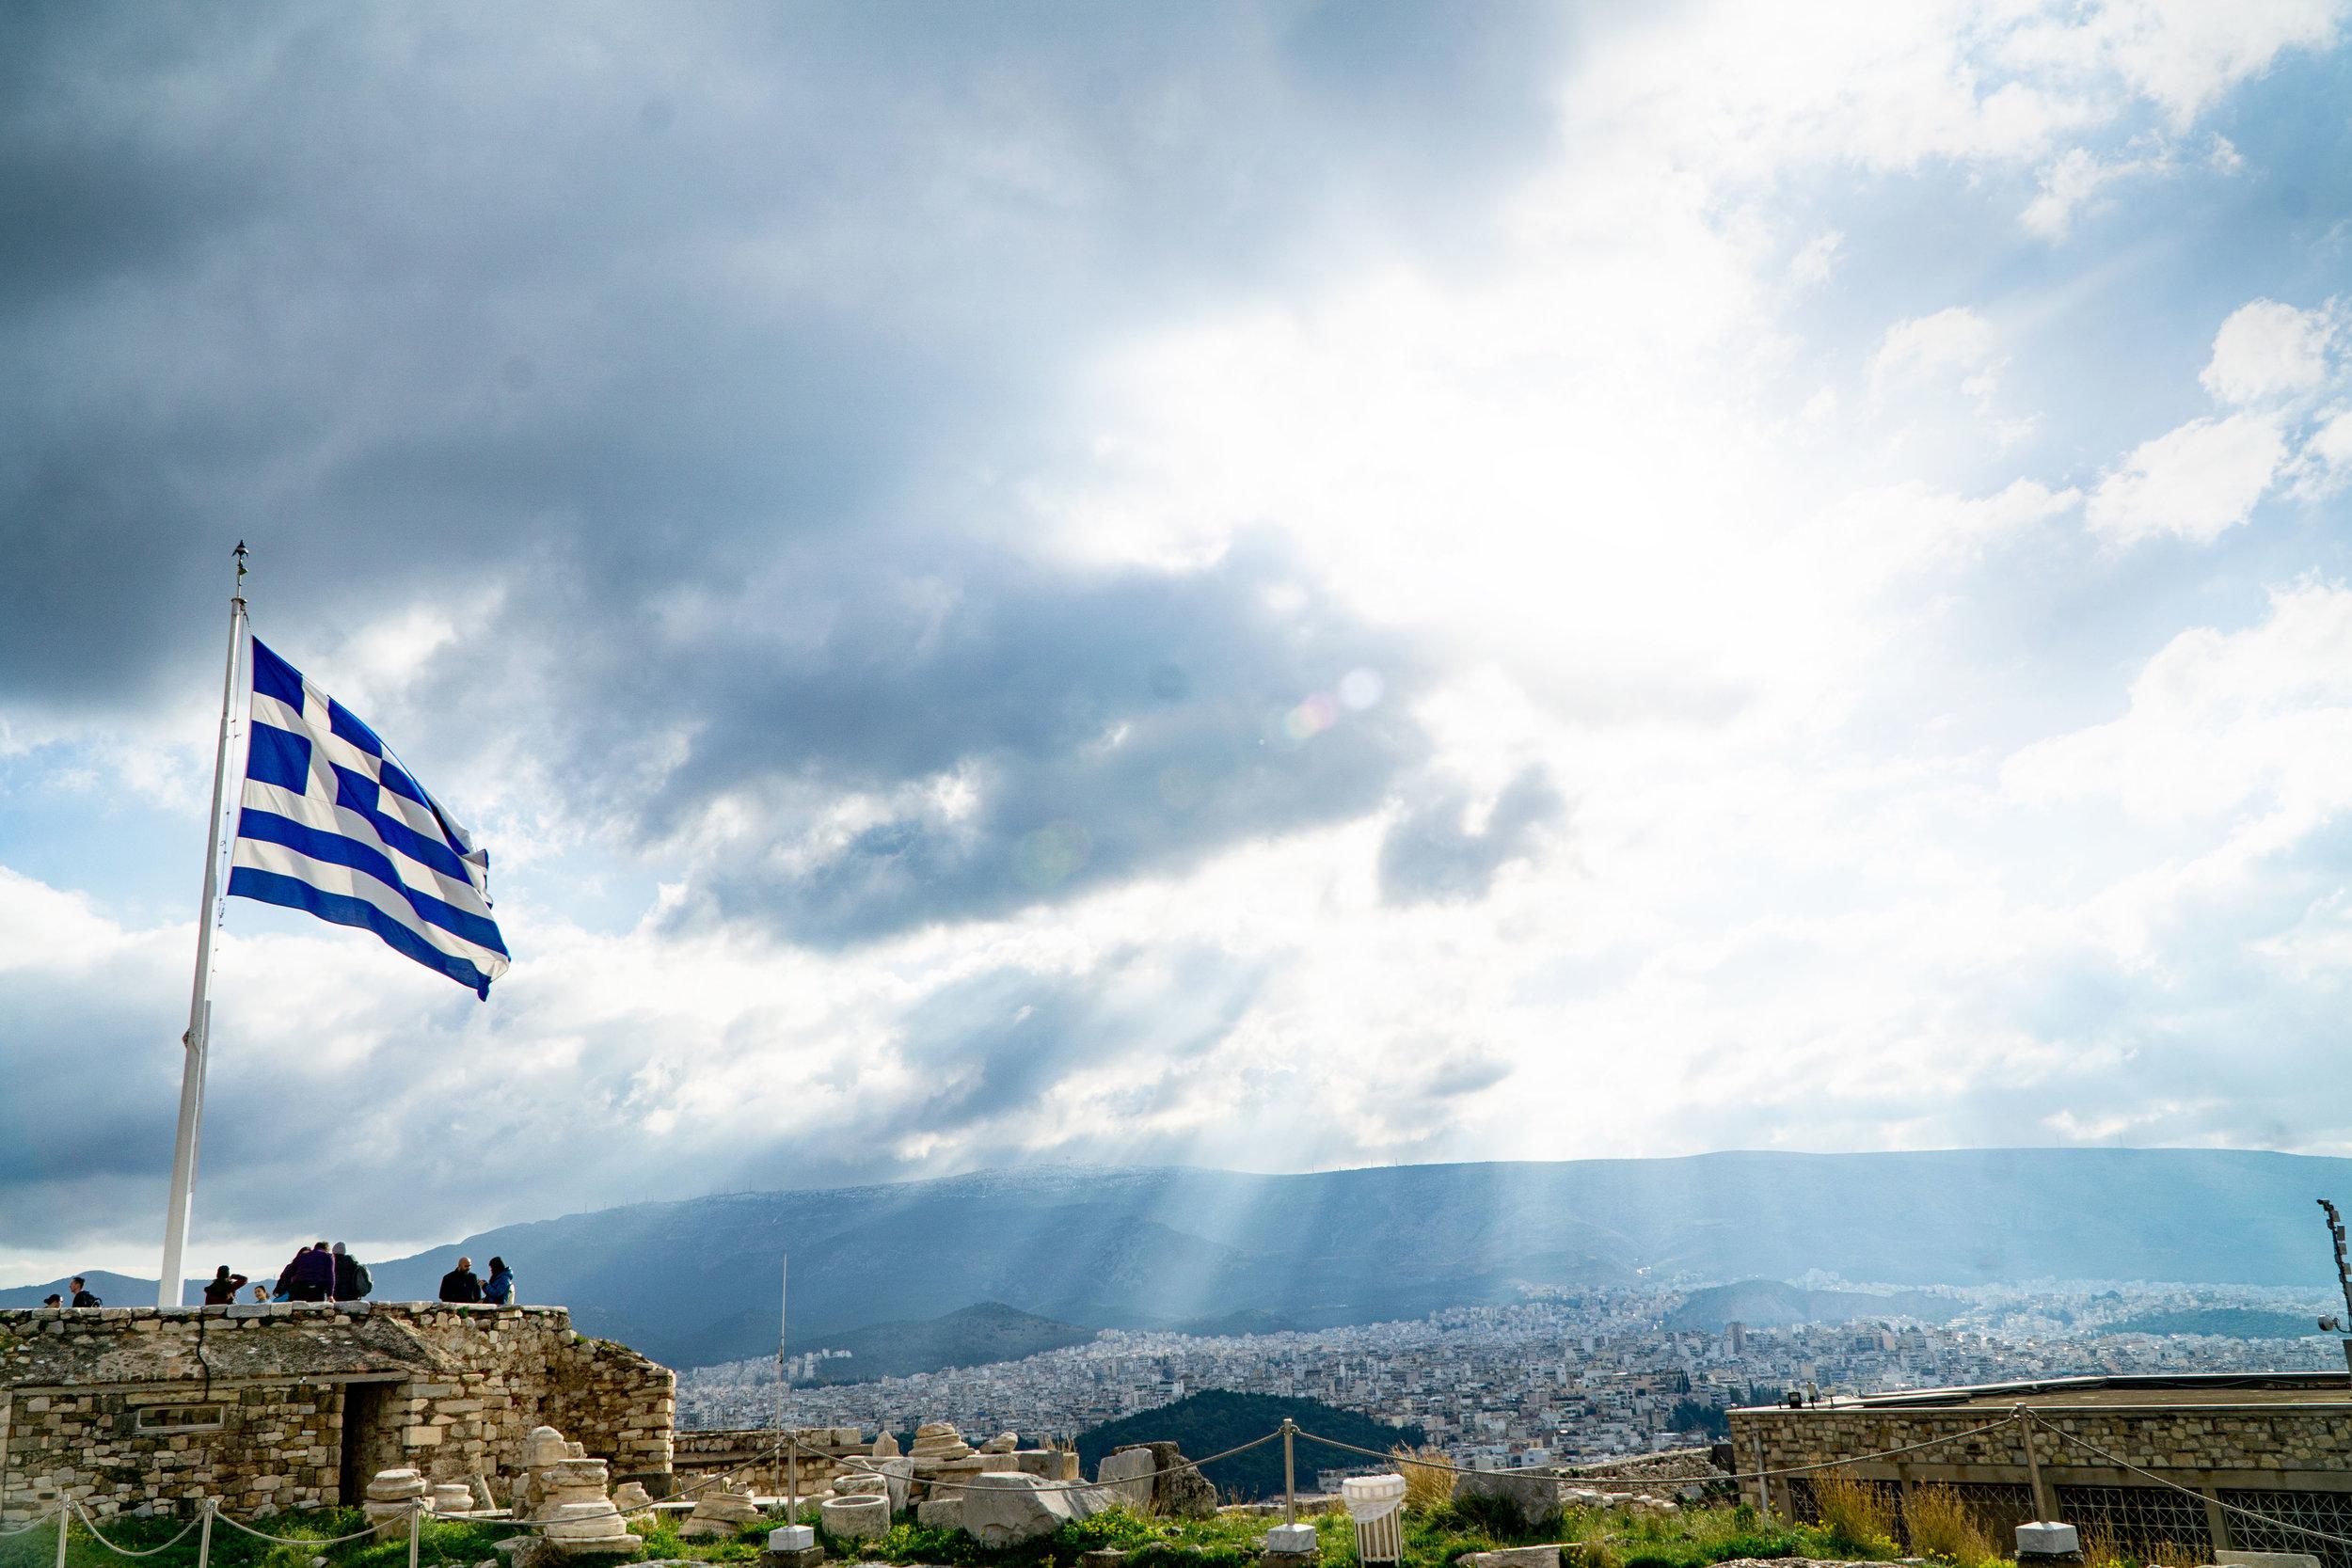 athens_acropolis_vickygood_travel_photography12sm.jpg